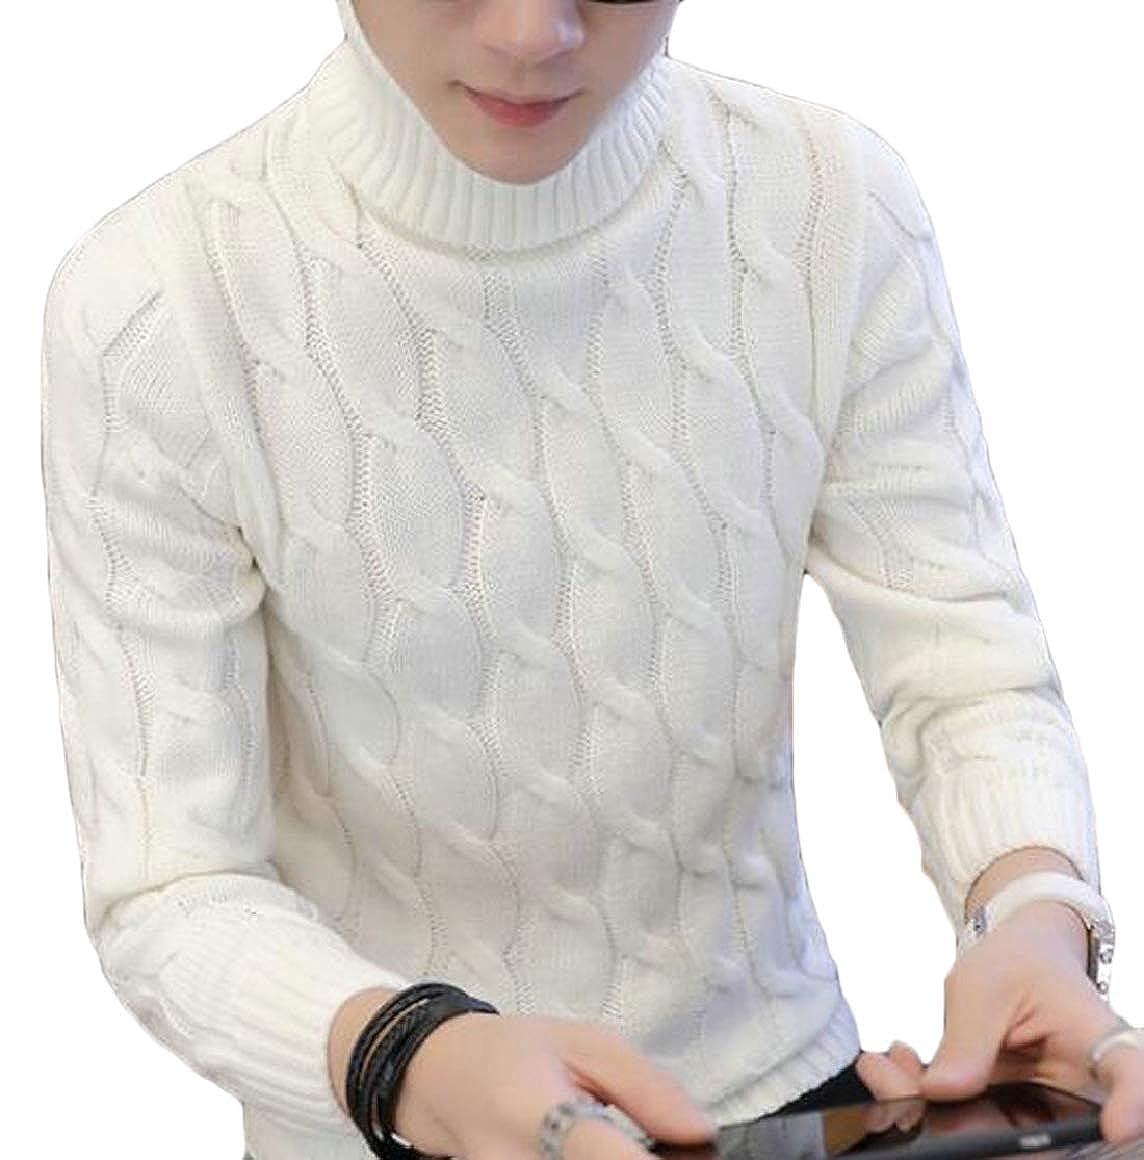 Ptyhk RG NEN Winter Knitted Sweater Turtleneck Sweater High Collar Pullovers